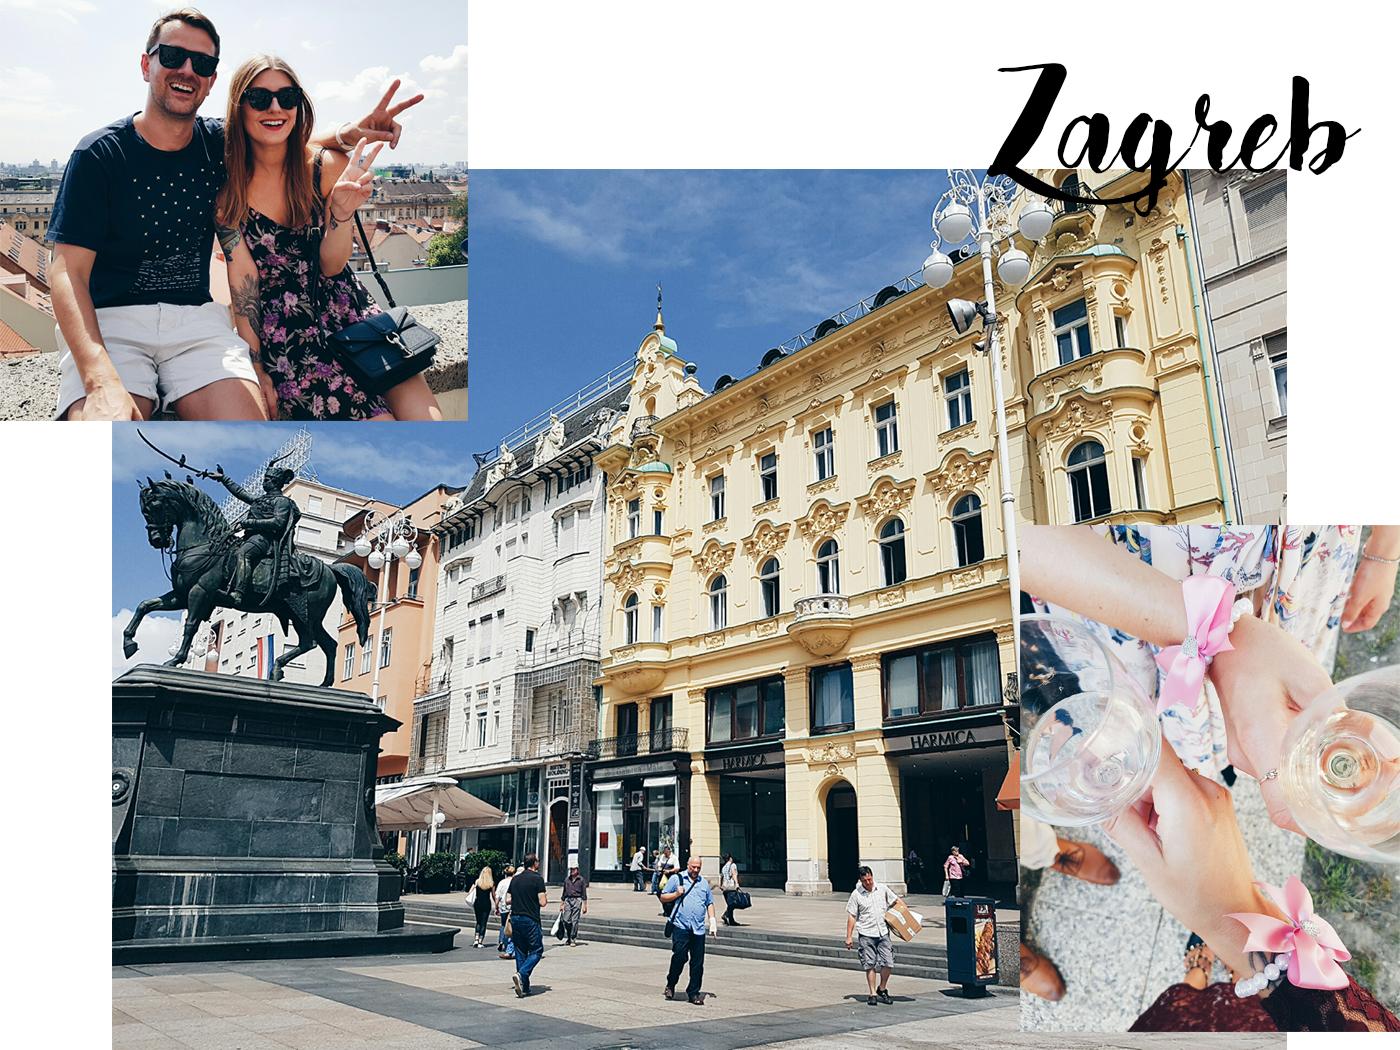 Travel_Istrien_2_Zagreb